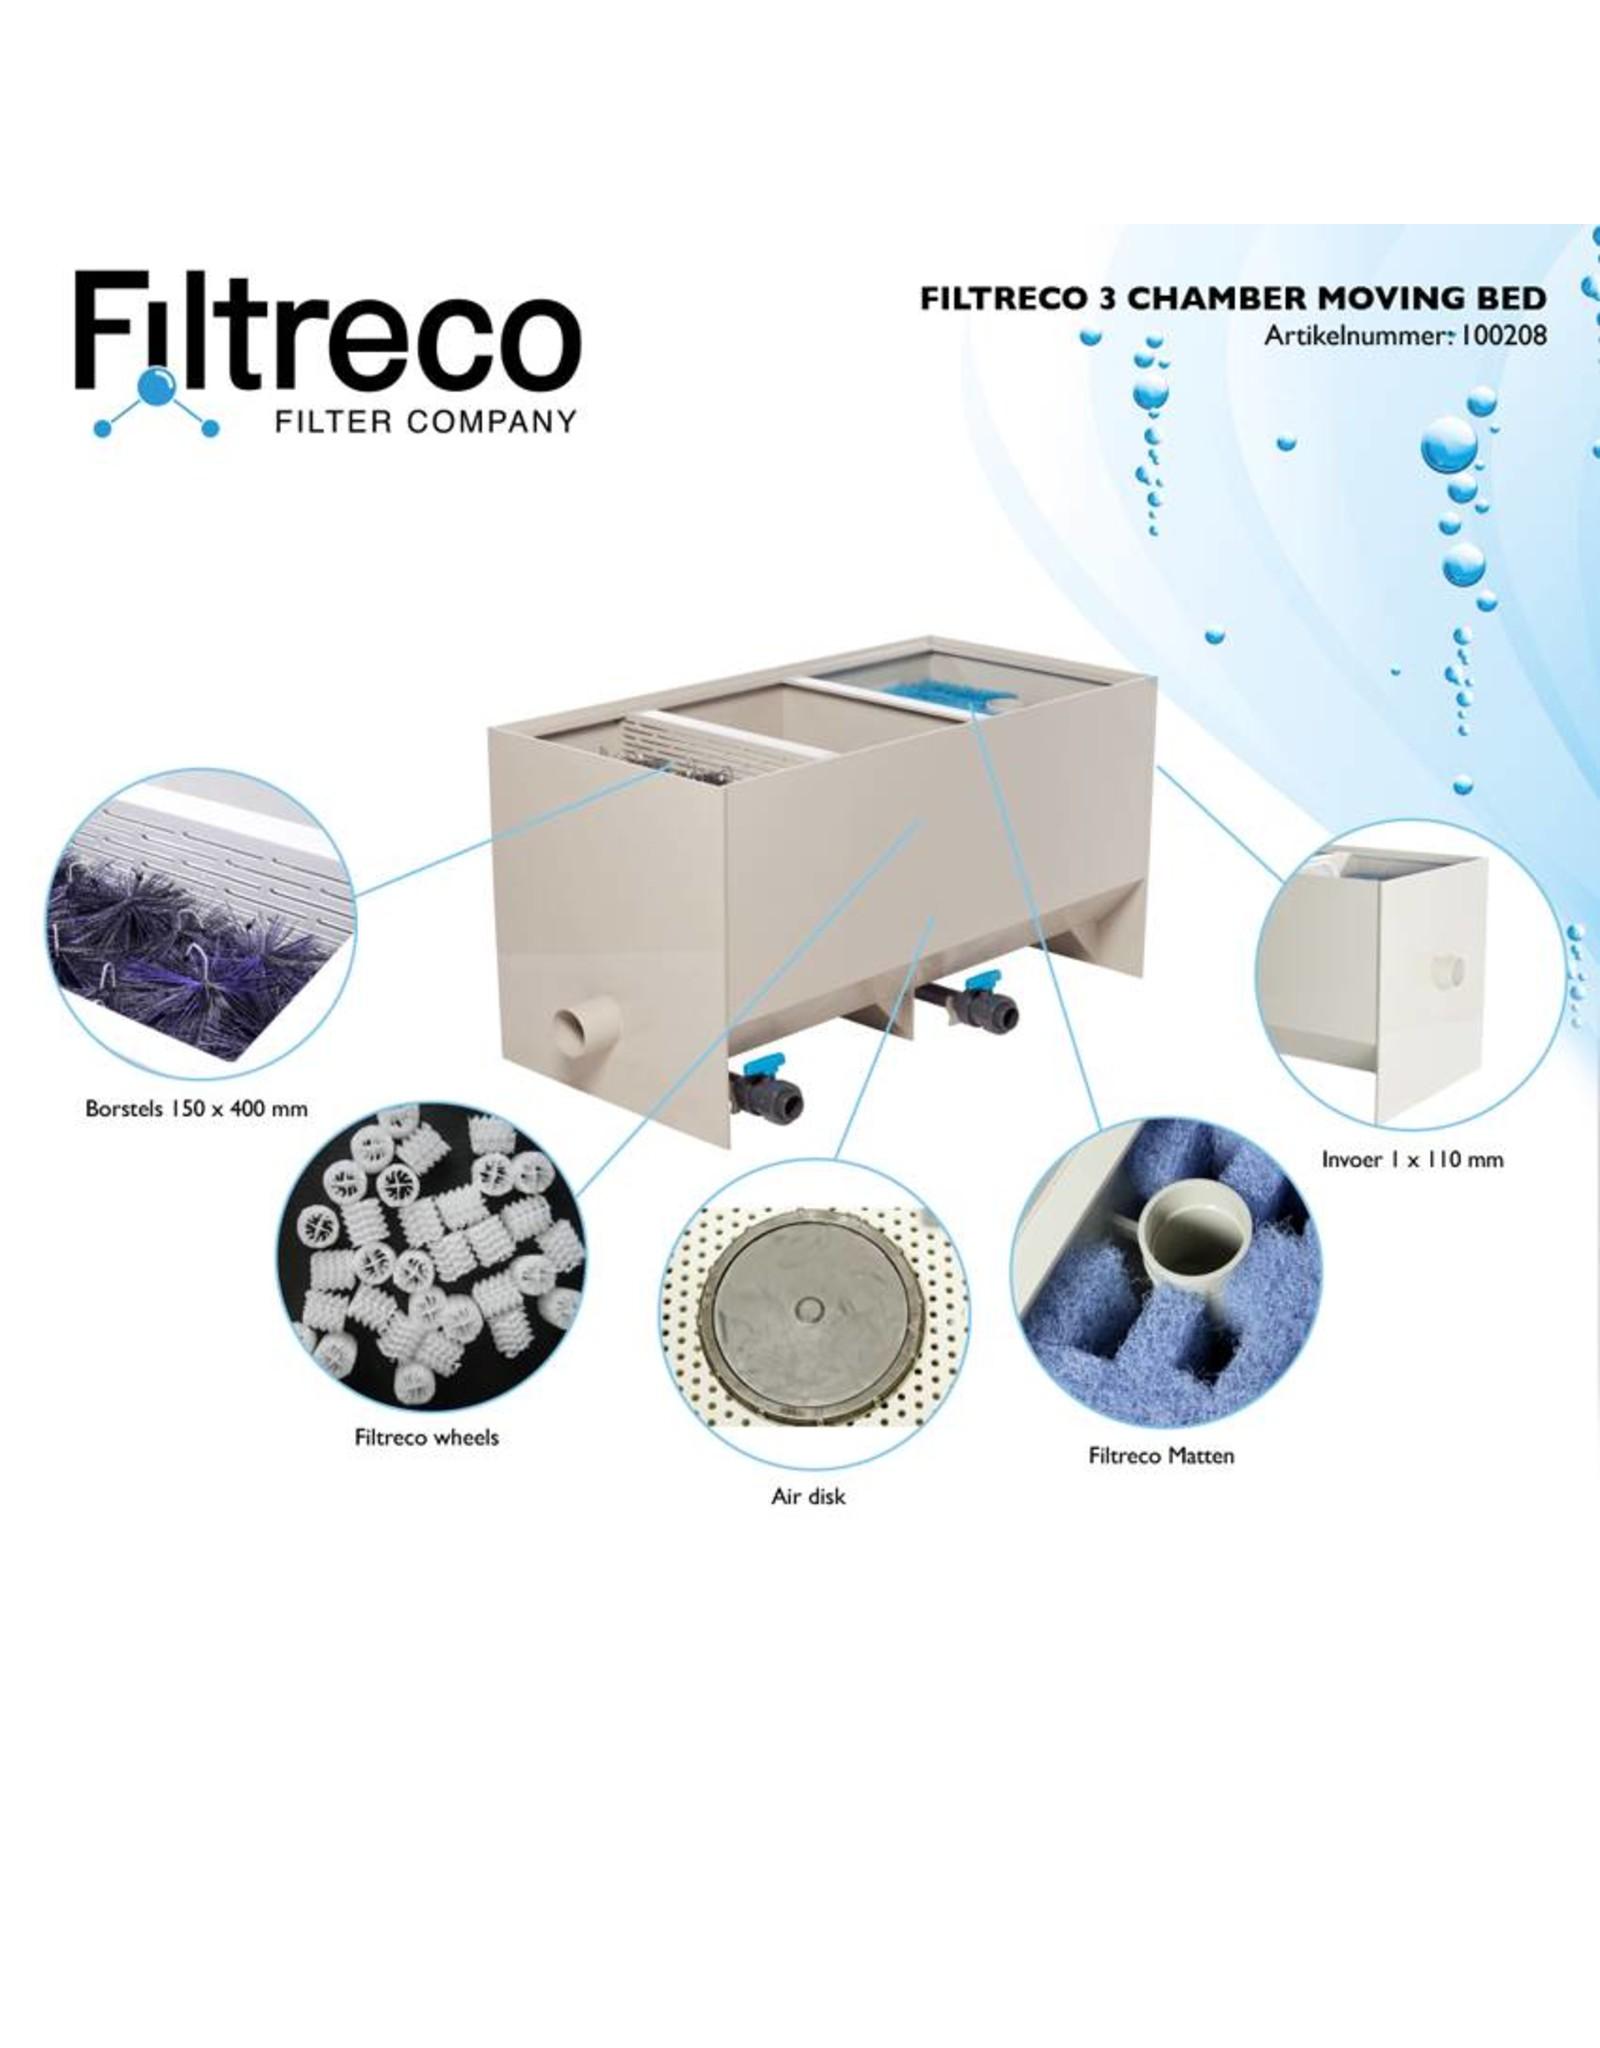 Filtreco Filtreco 3 Chamber Moving Bed